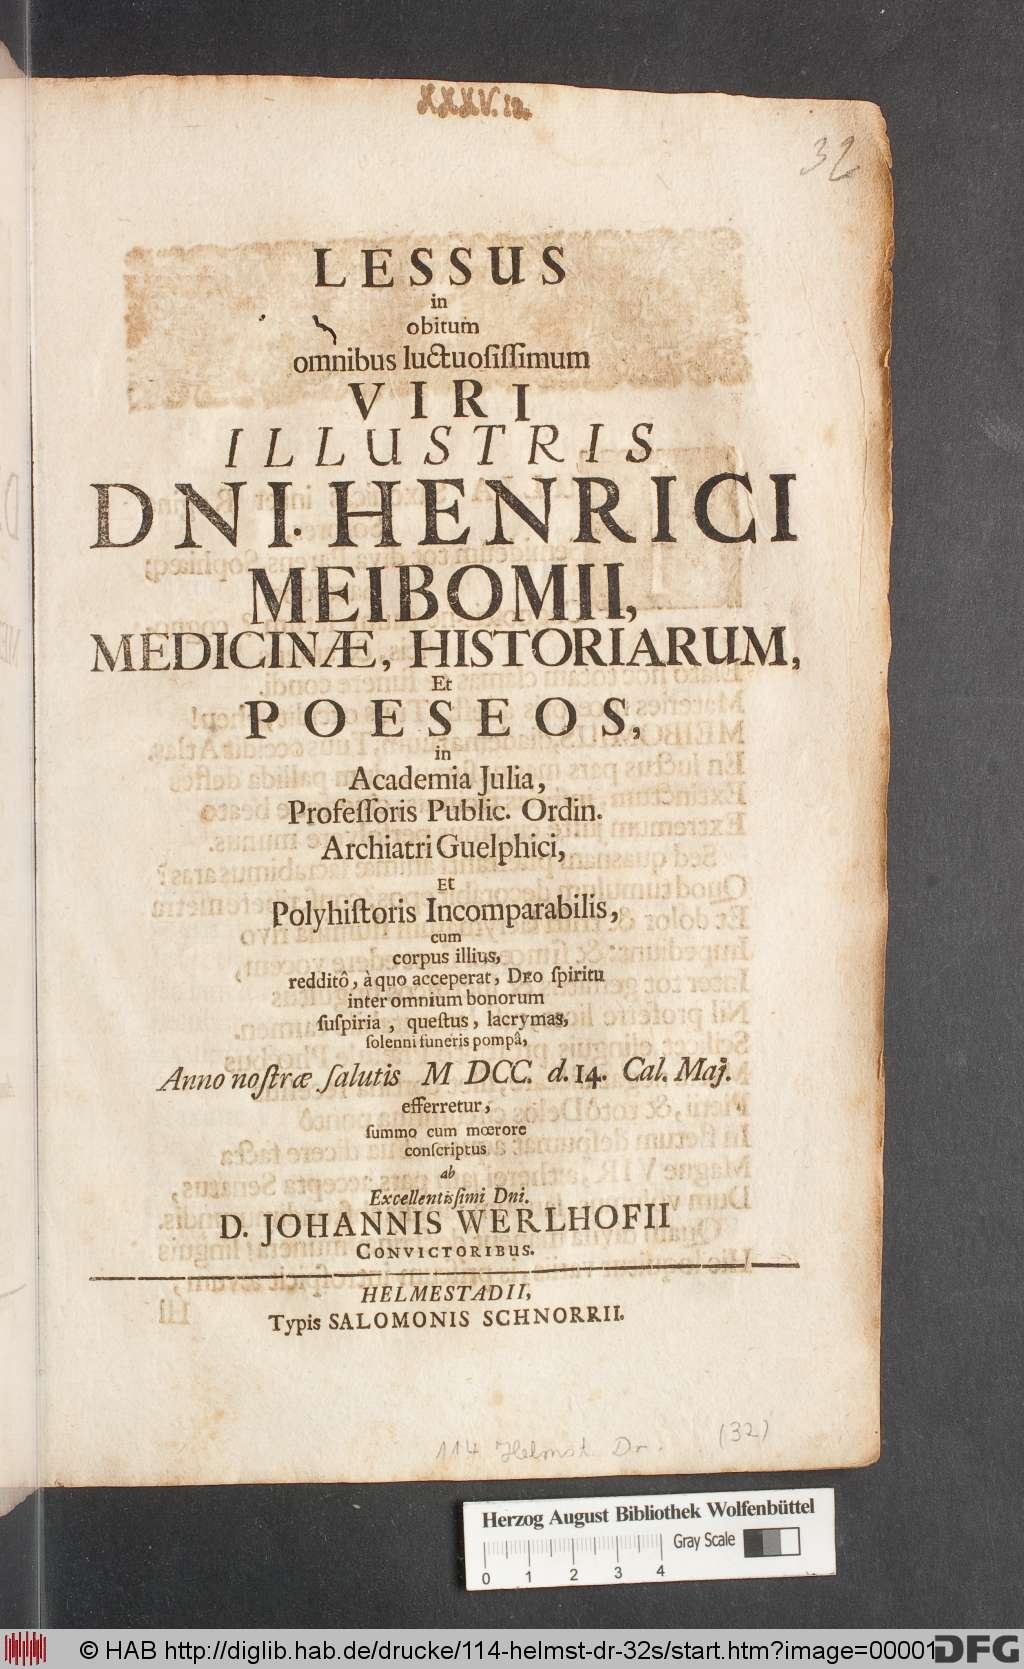 http://diglib.hab.de/drucke/114-helmst-dr-32s/00001.jpg